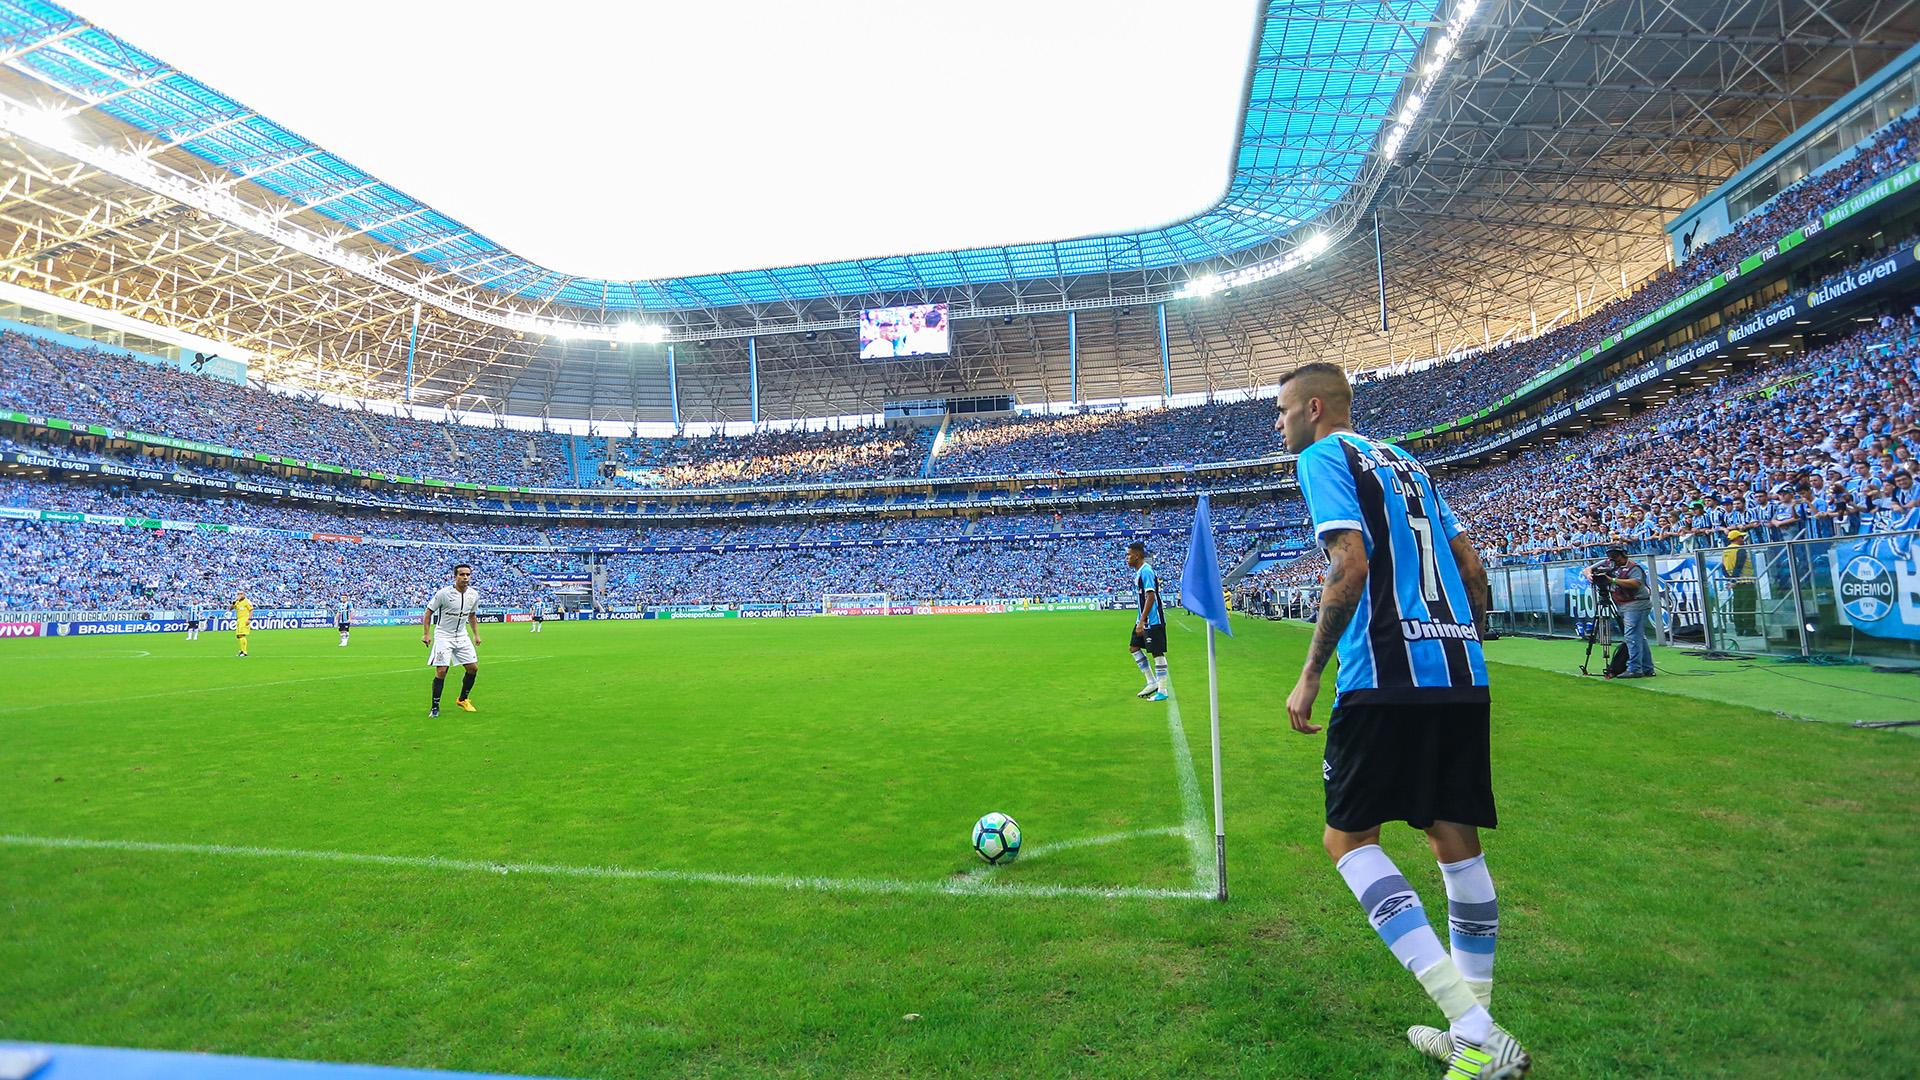 Luan Arena Gremio Gremio Corinthians Brasileirao Serie A 25062017